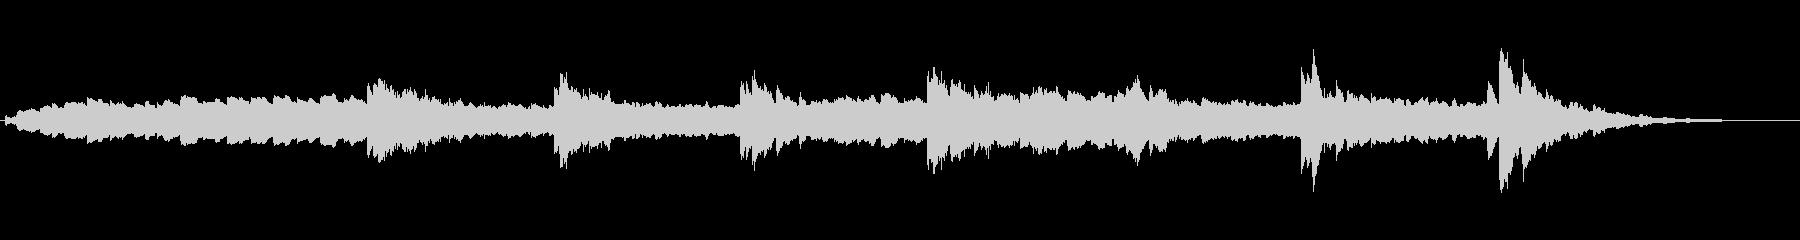 c 30秒企業PV向け静謐で神秘的な曲の未再生の波形